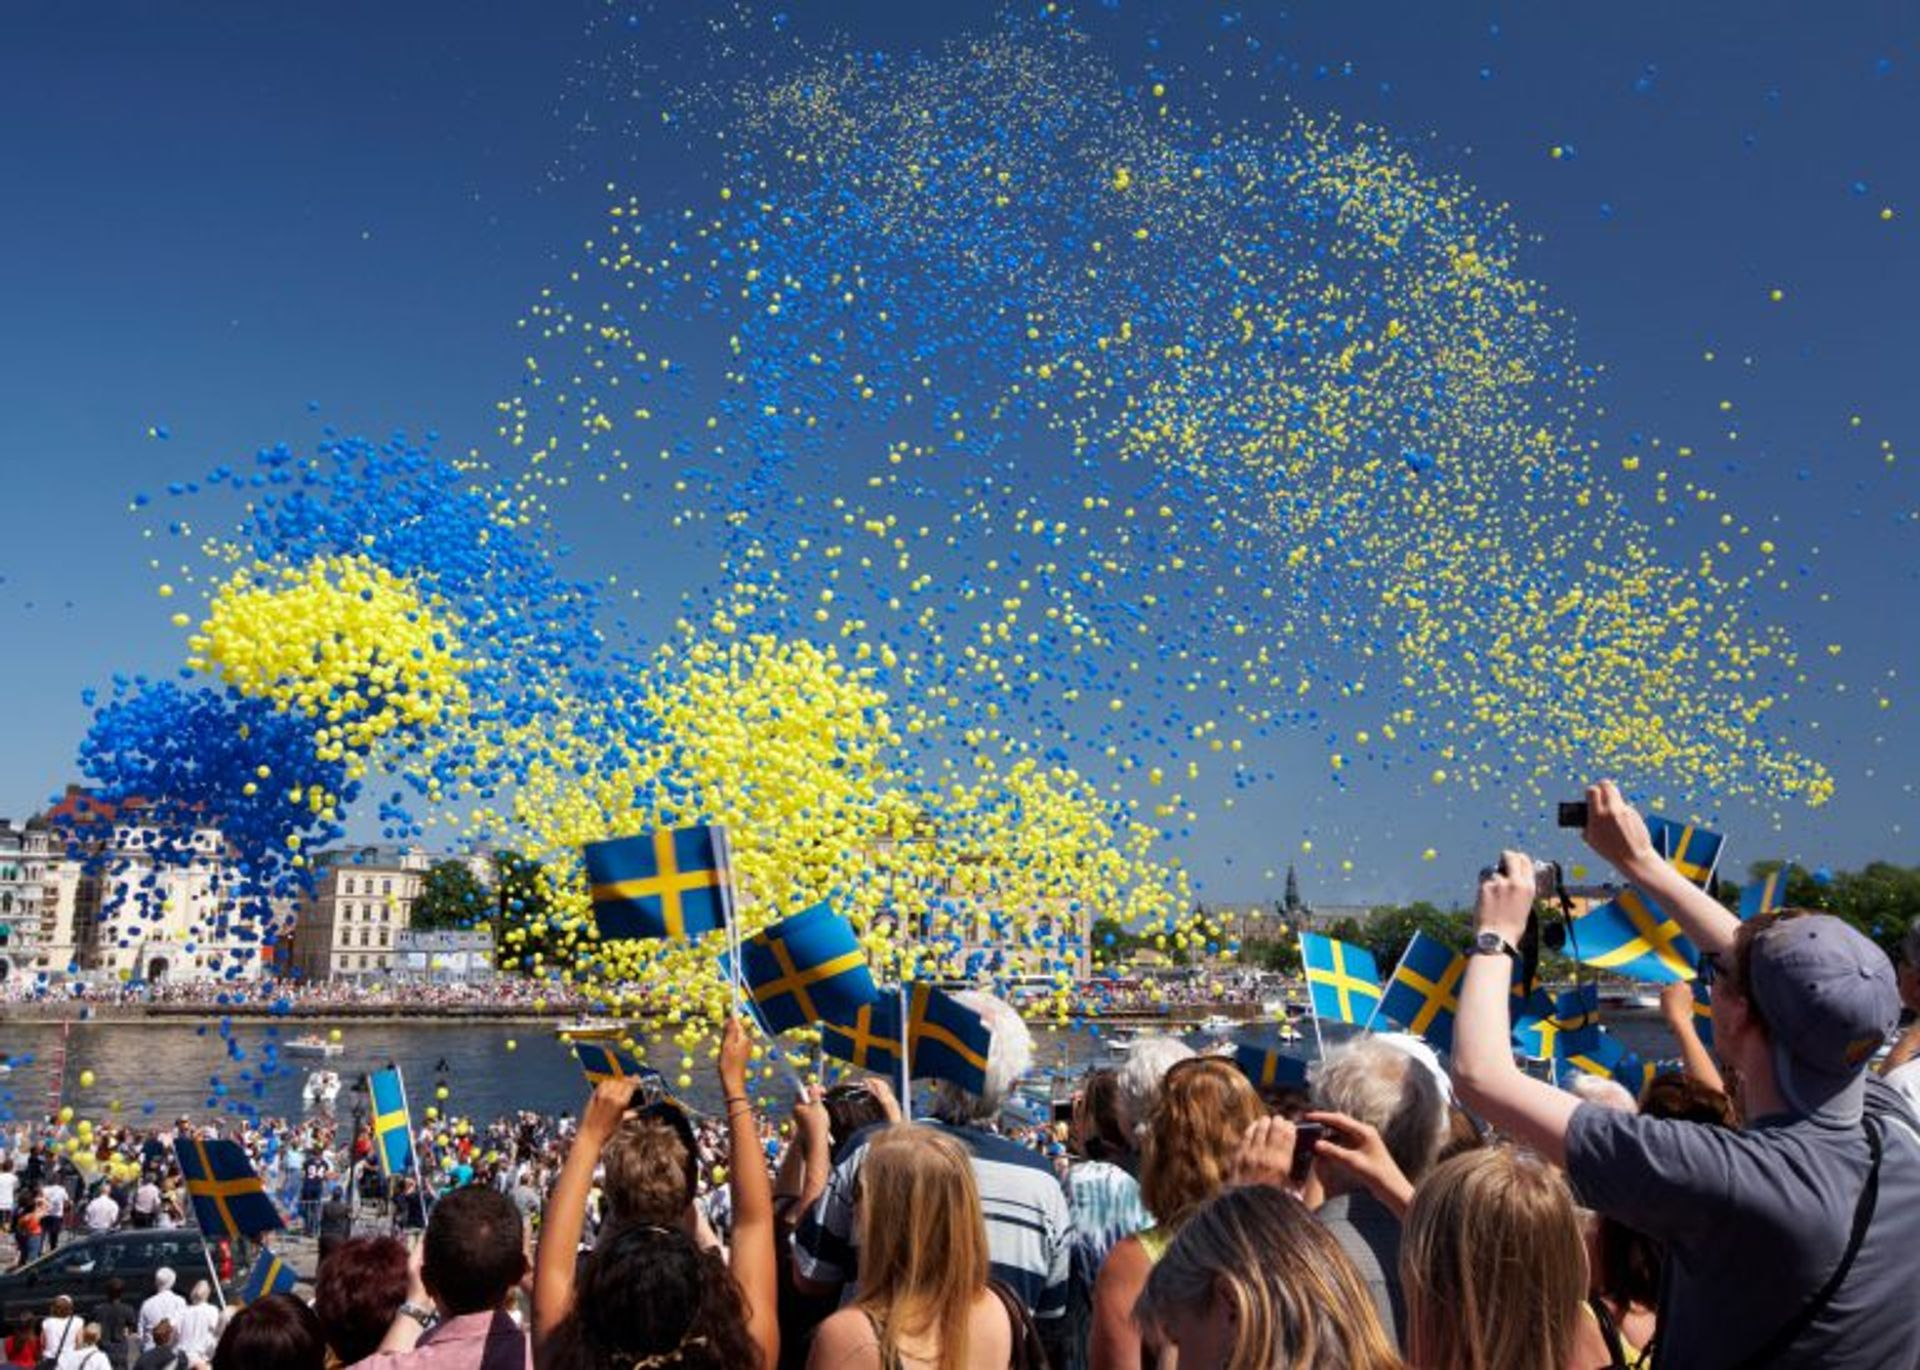 People waving Swedish flags in celebration.